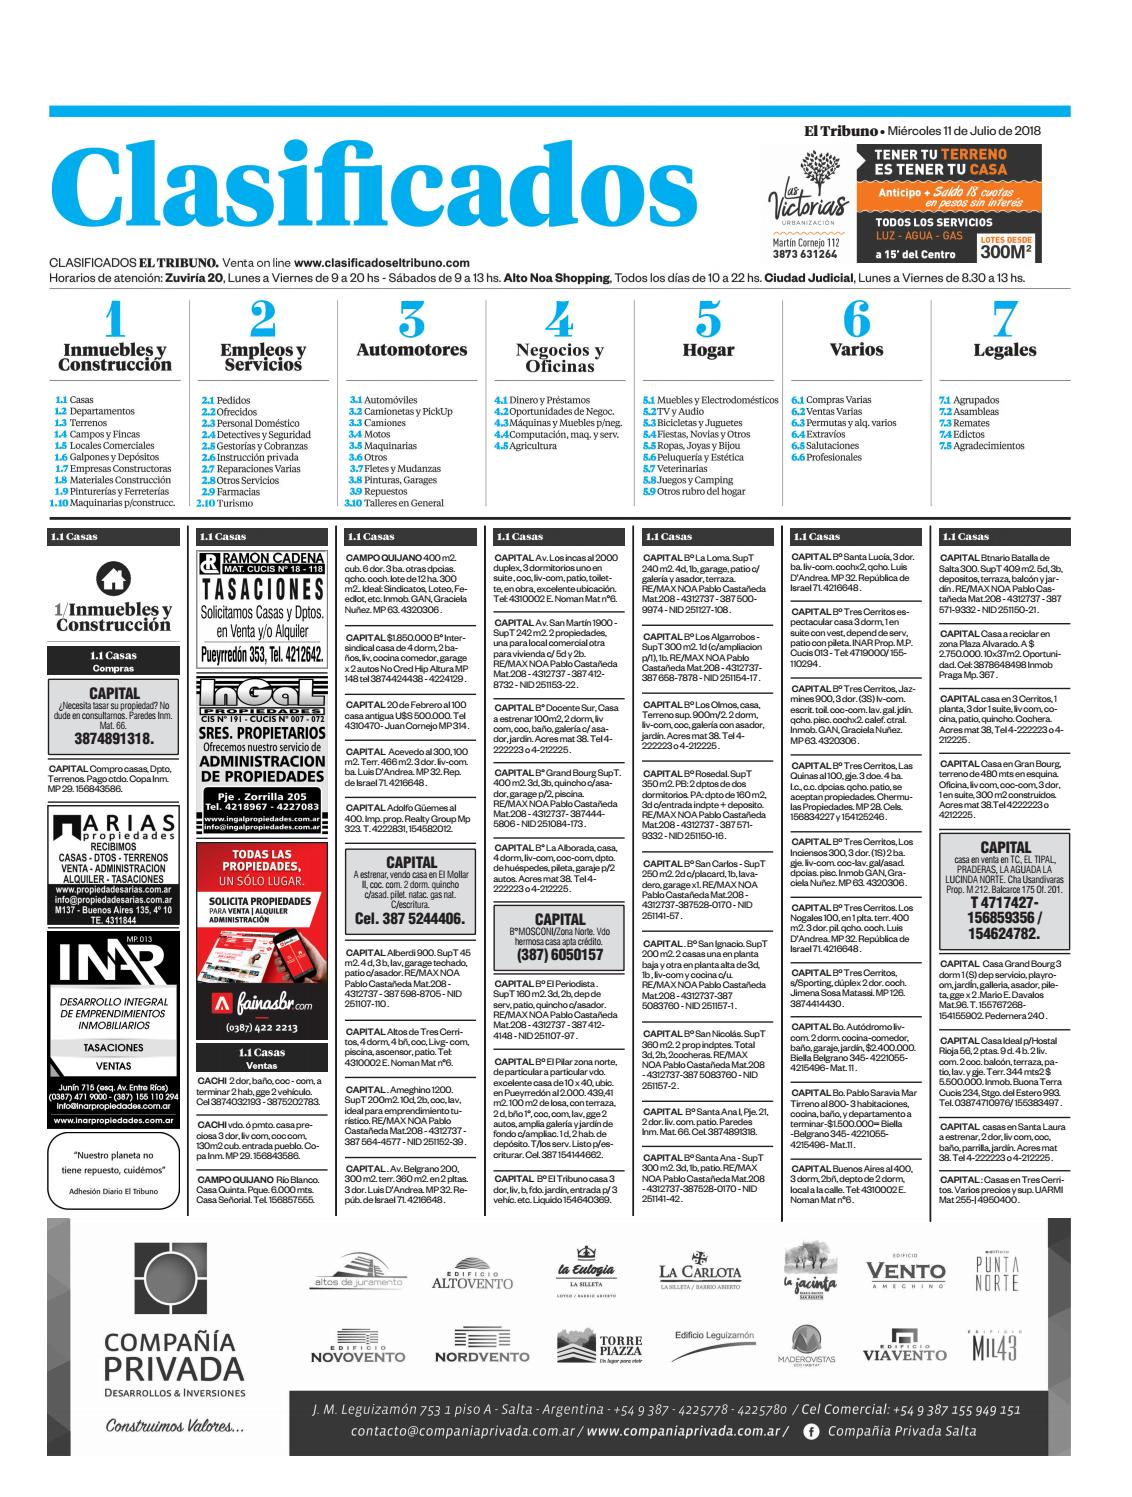 El Issuu Tribuno De 2018 Julio Clasificados By 11 FJcT3lK1